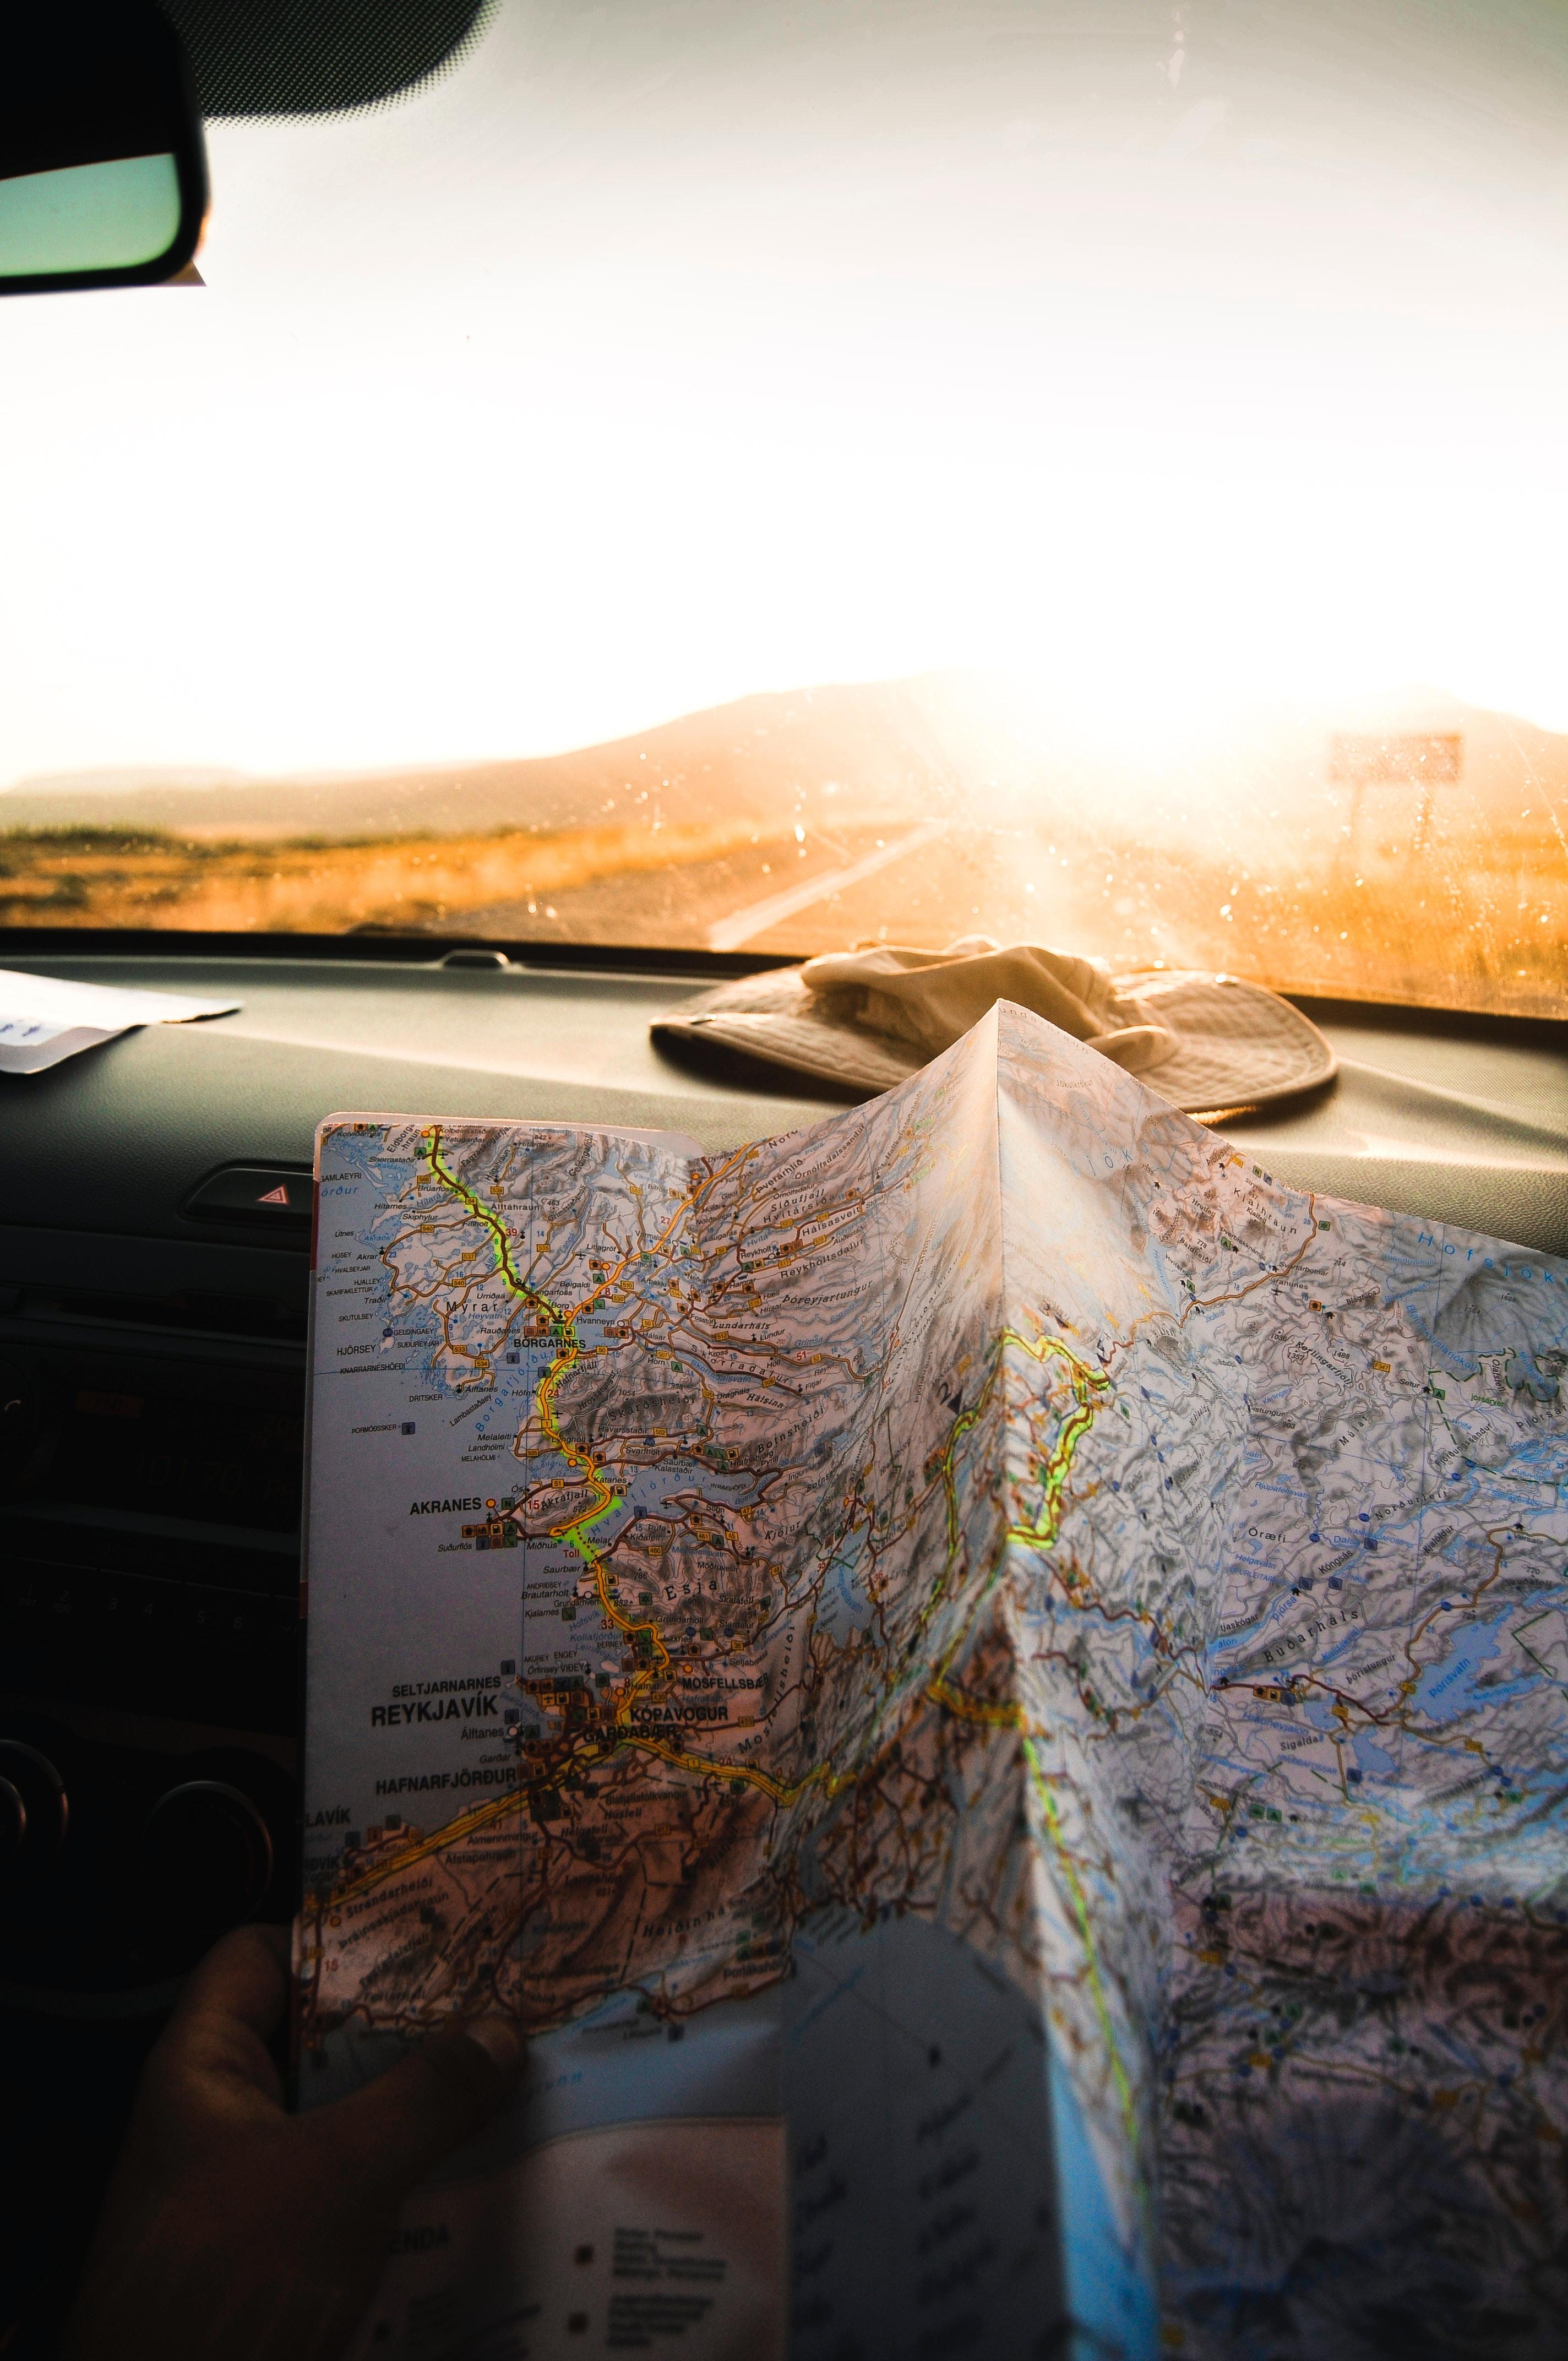 Kreuzfahrt Ausflug Selbst Organisieren